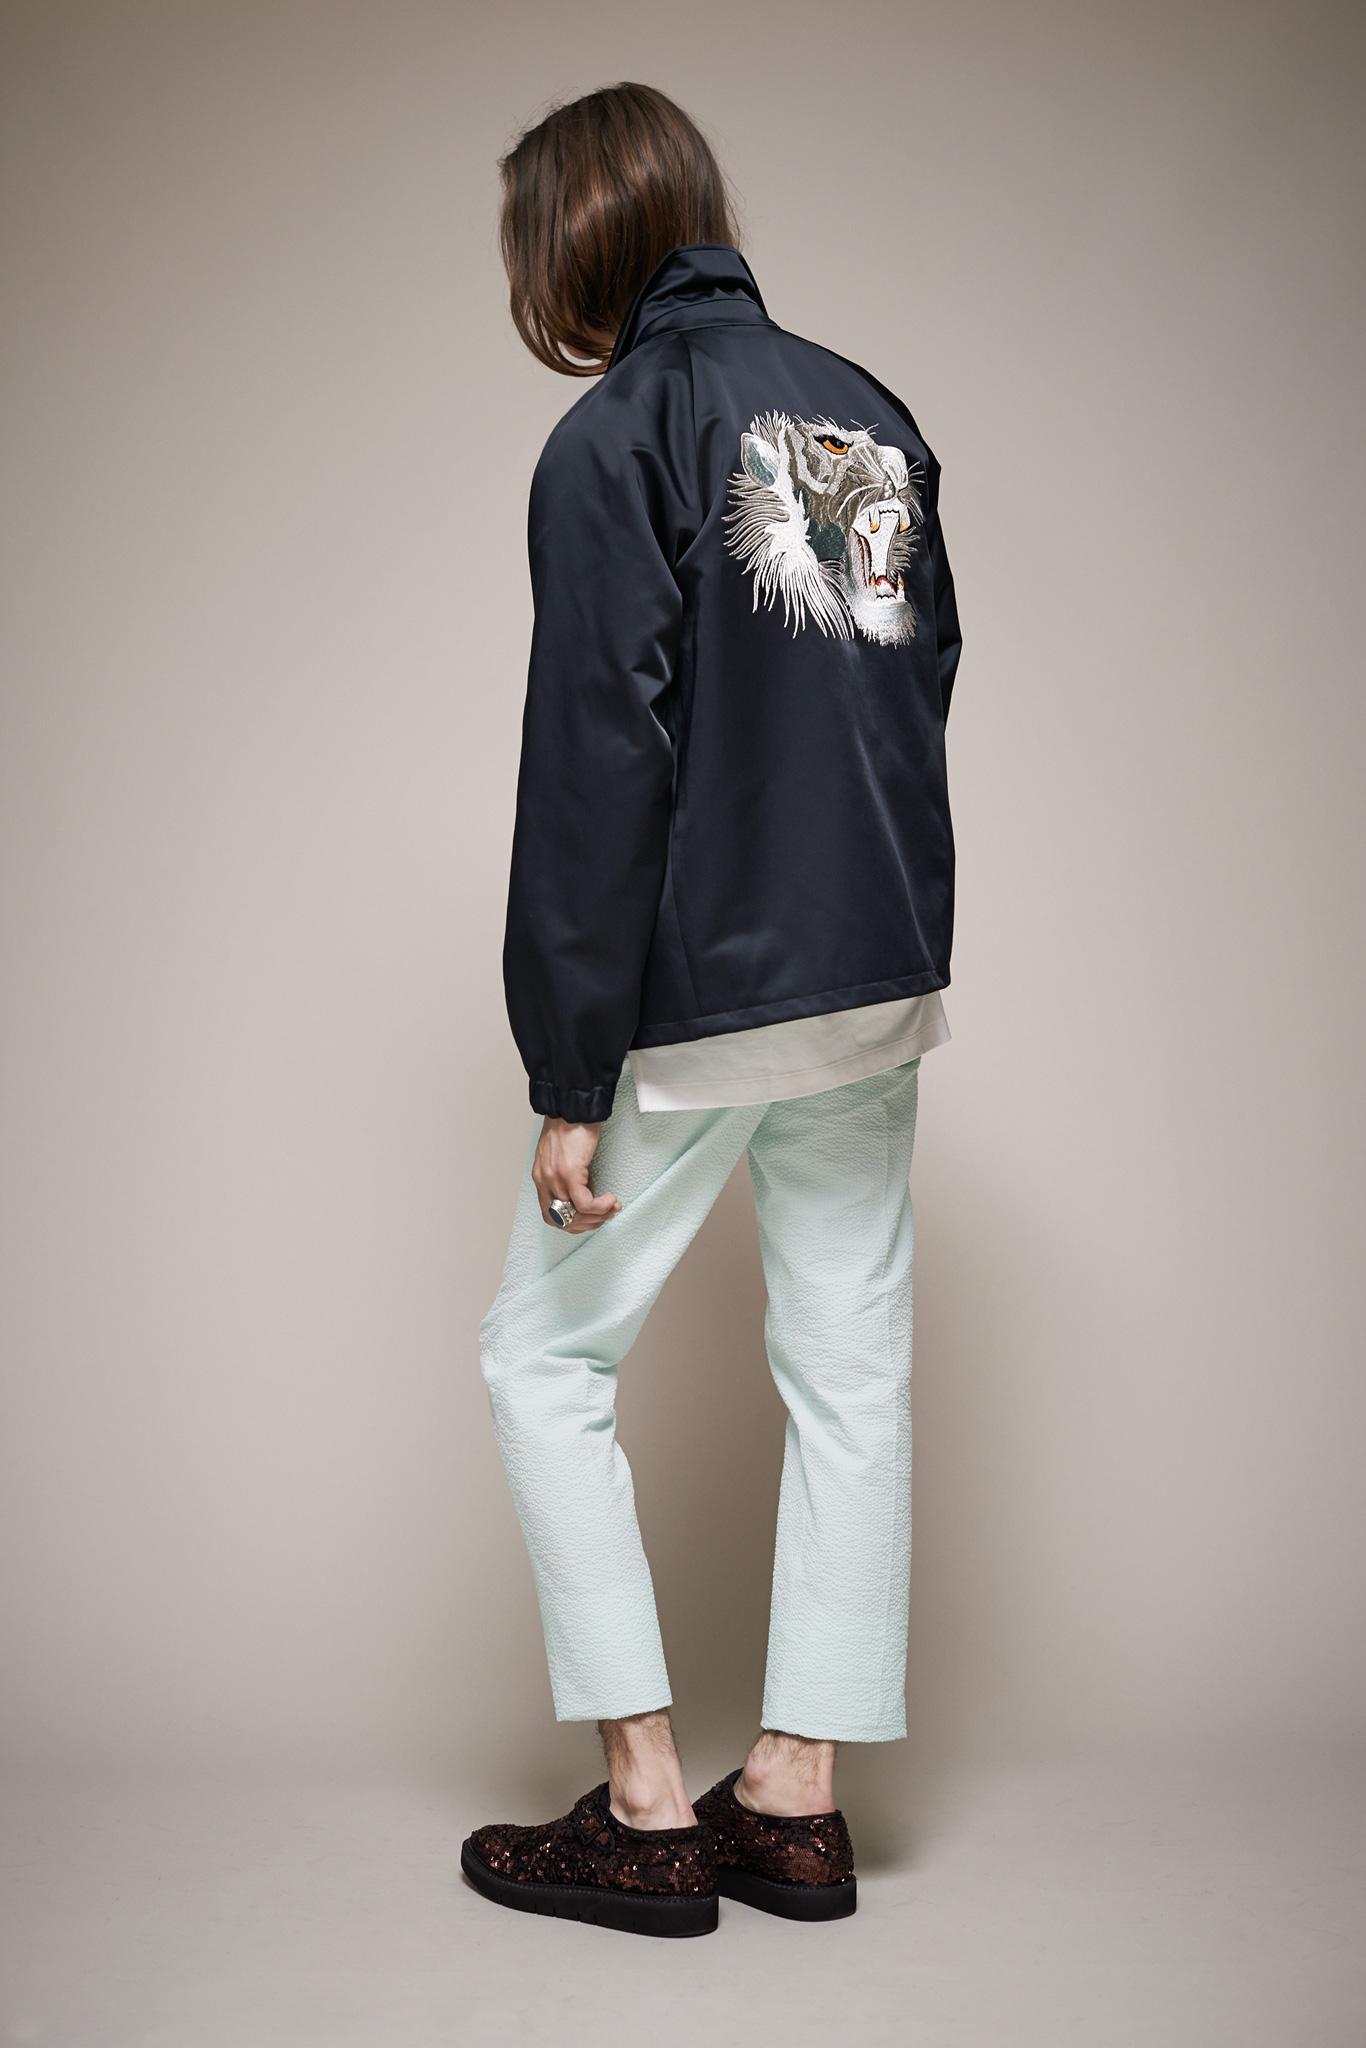 Marc Jacobs S/S 2016